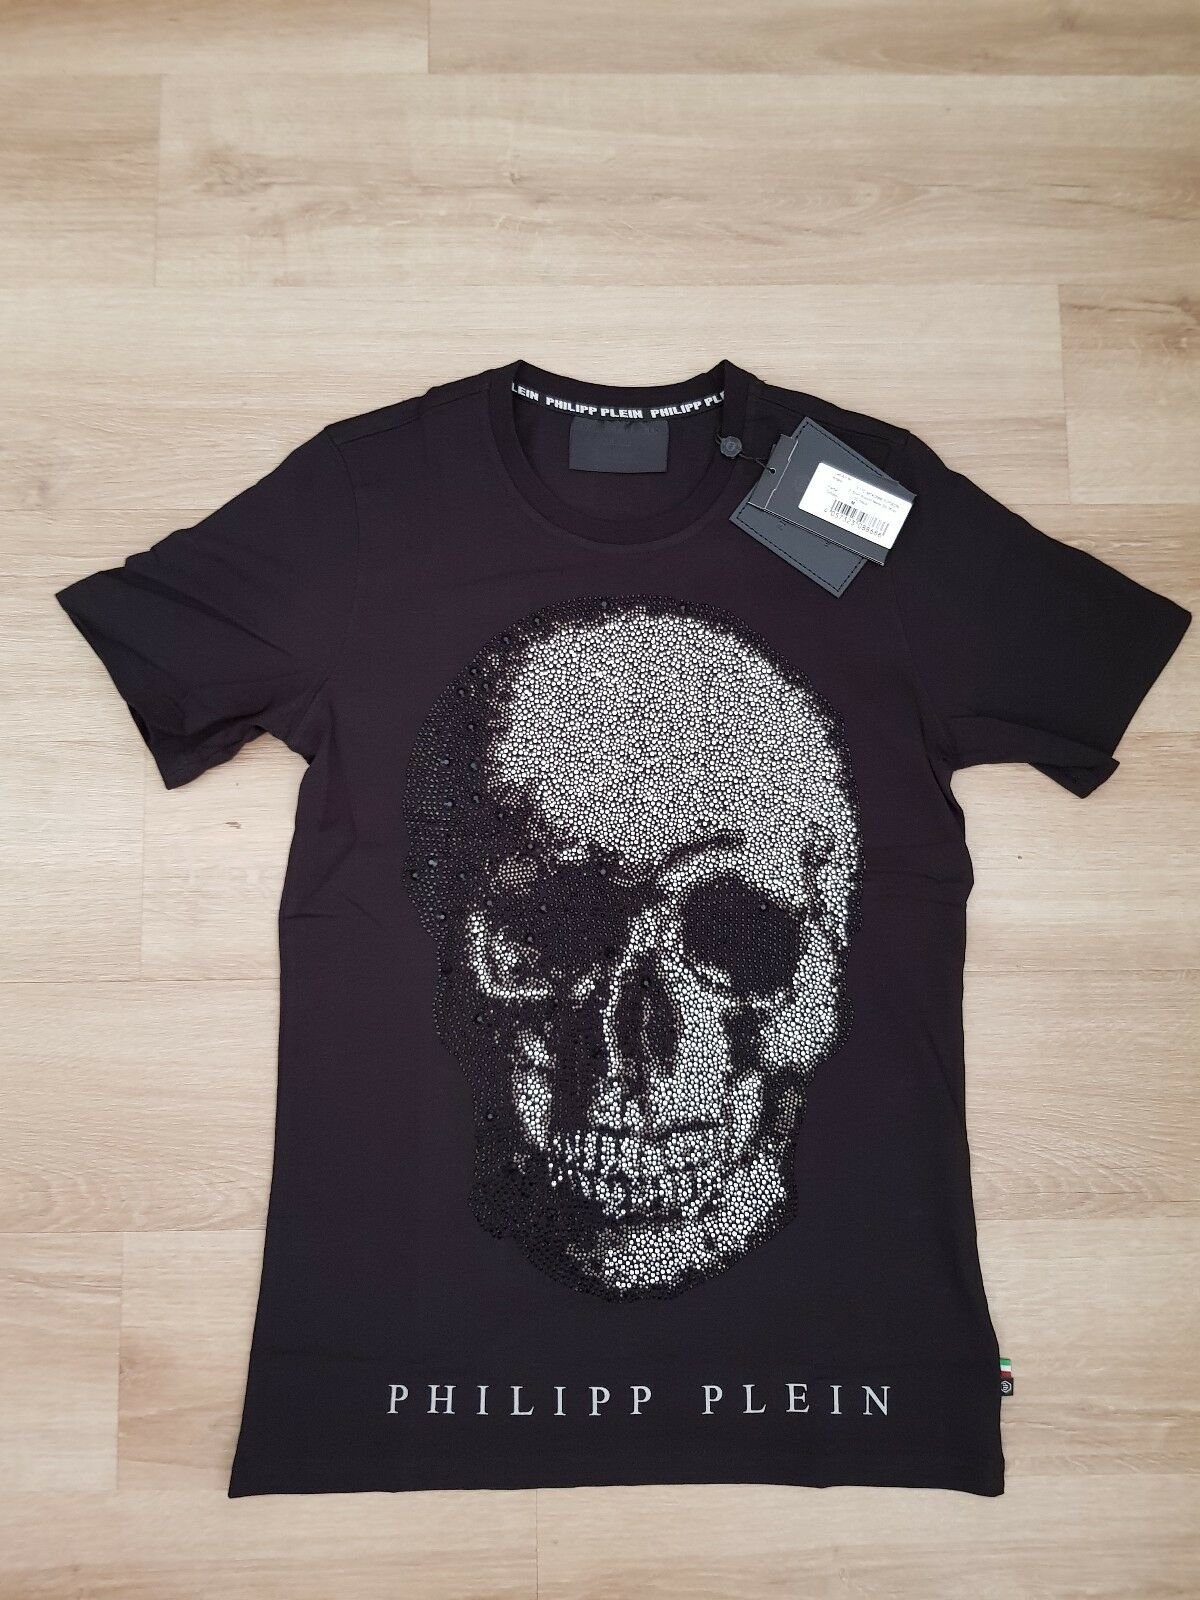 Philipp Plein T-Shirt   Kivo   Gr. M Neu